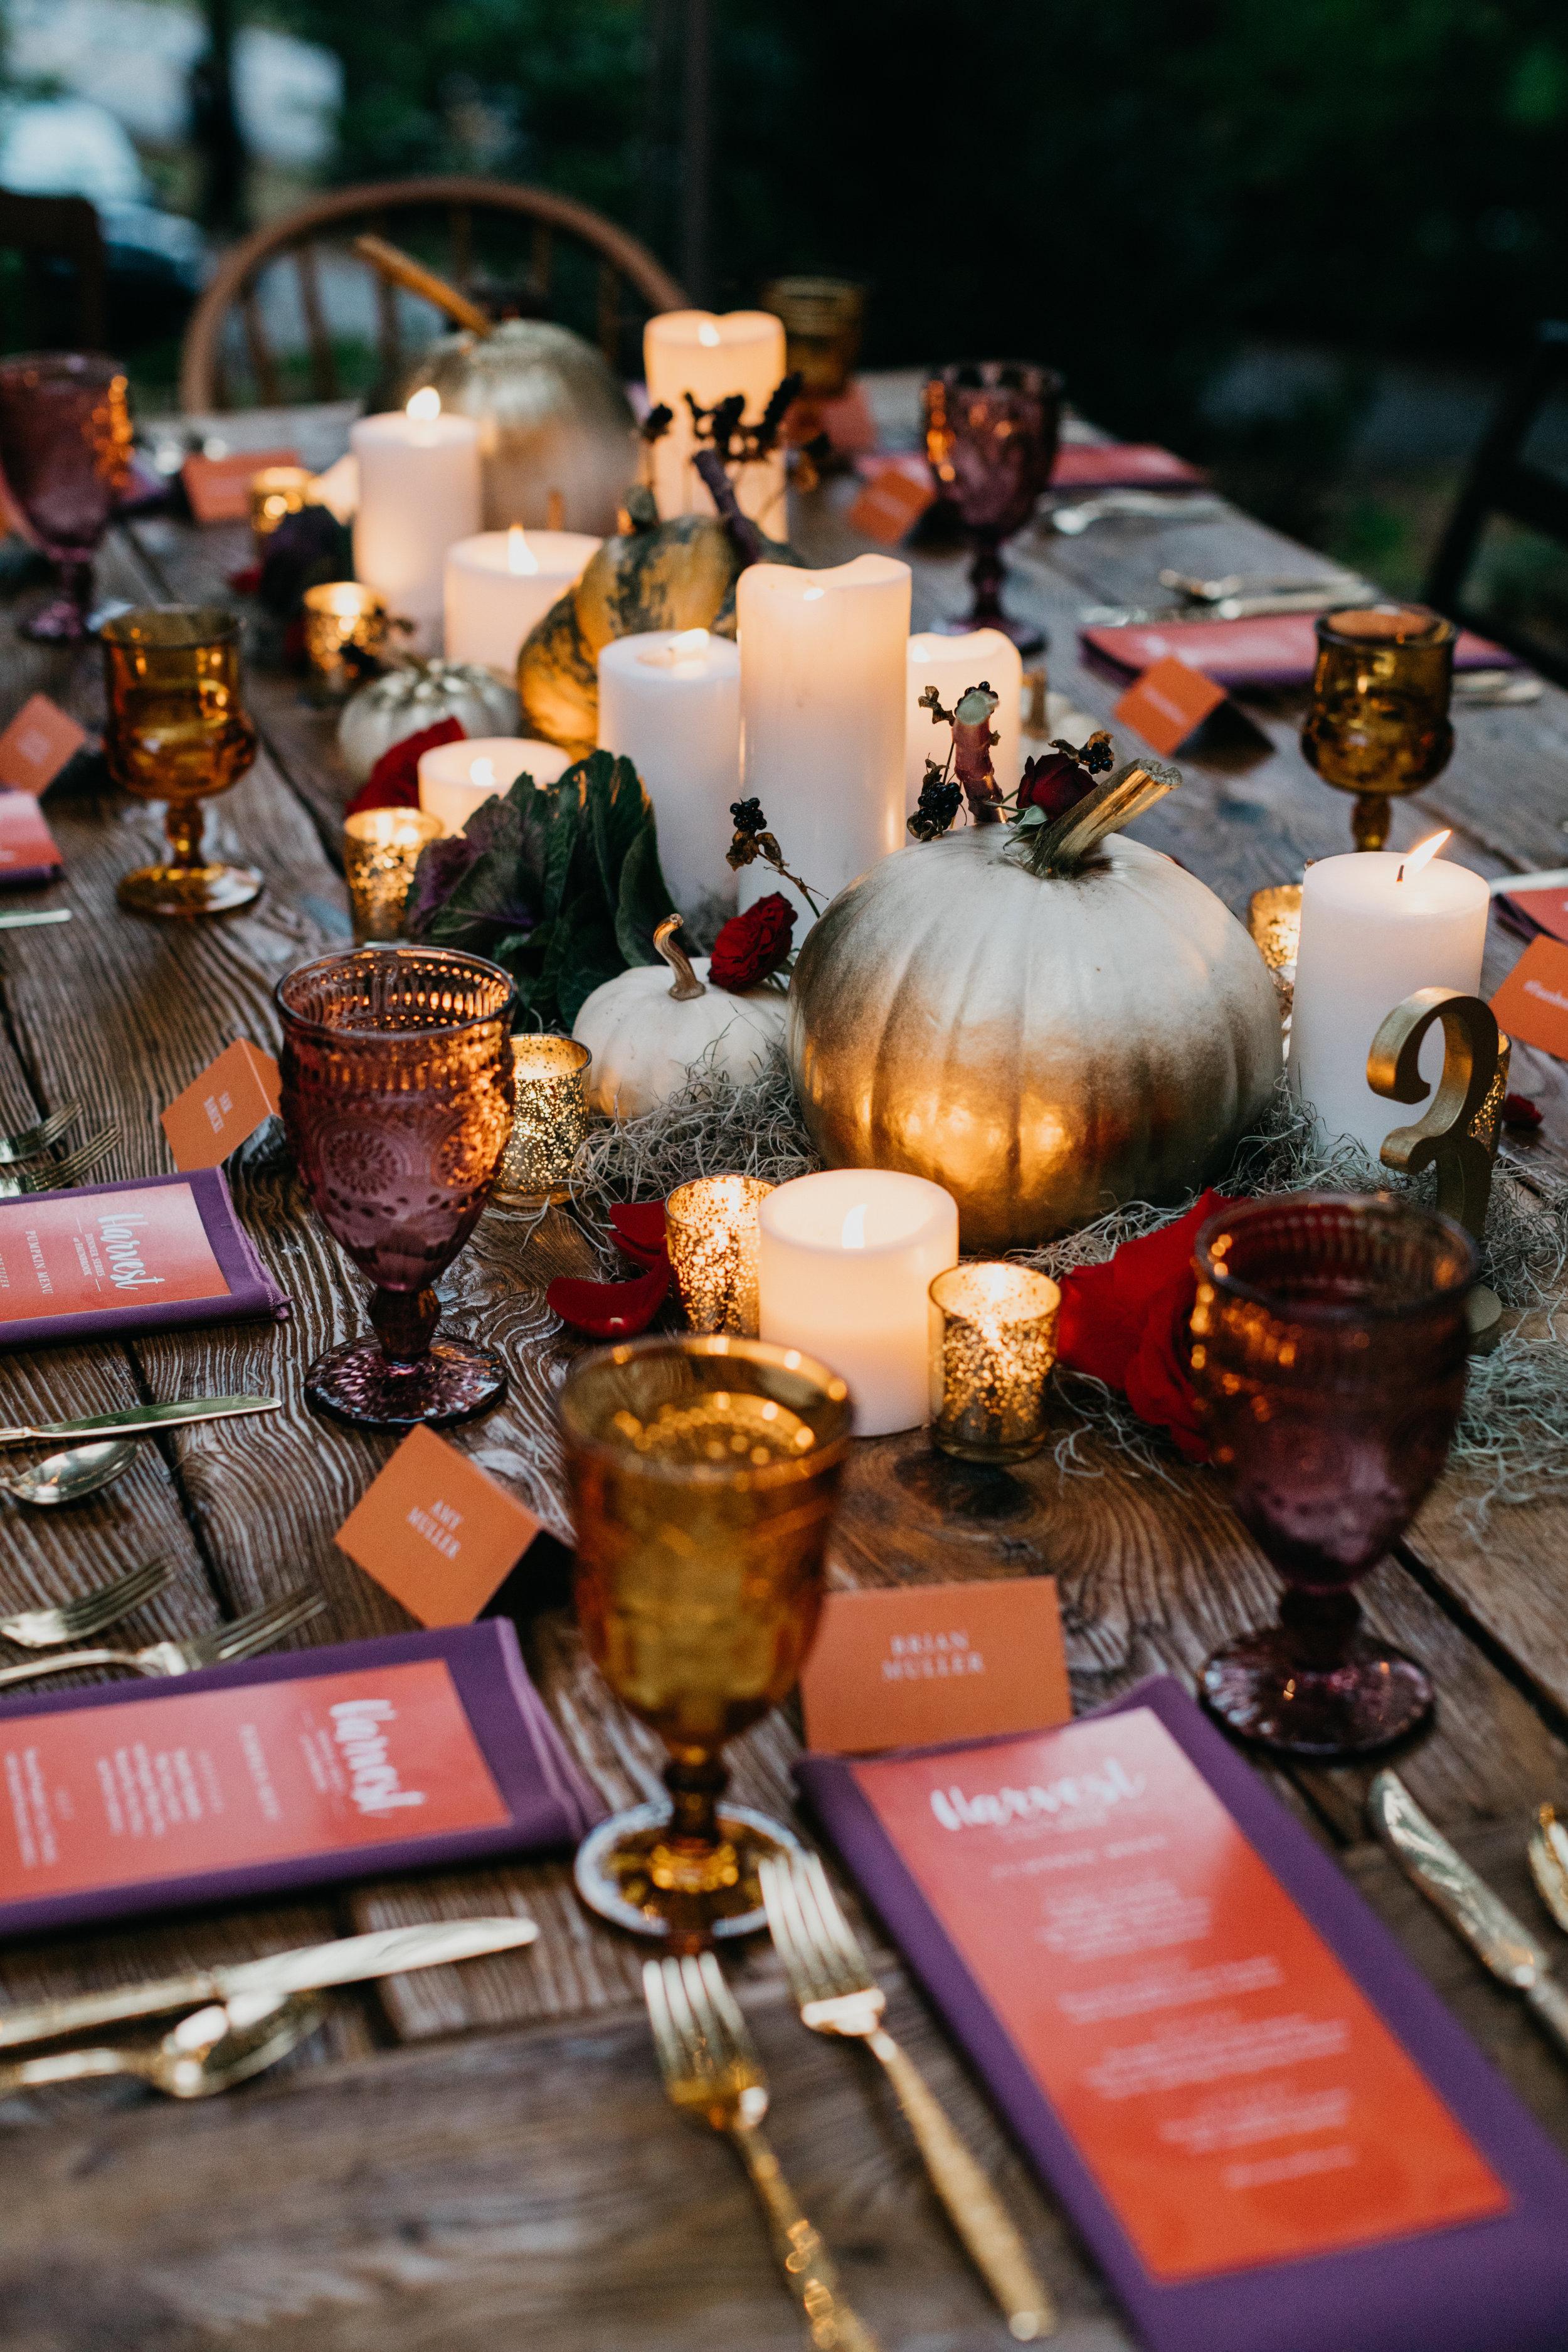 West-Chester-PA-Faunbrook-Harvest-Dinner-Series-Pumpkin-JustinJohnson-70.jpg